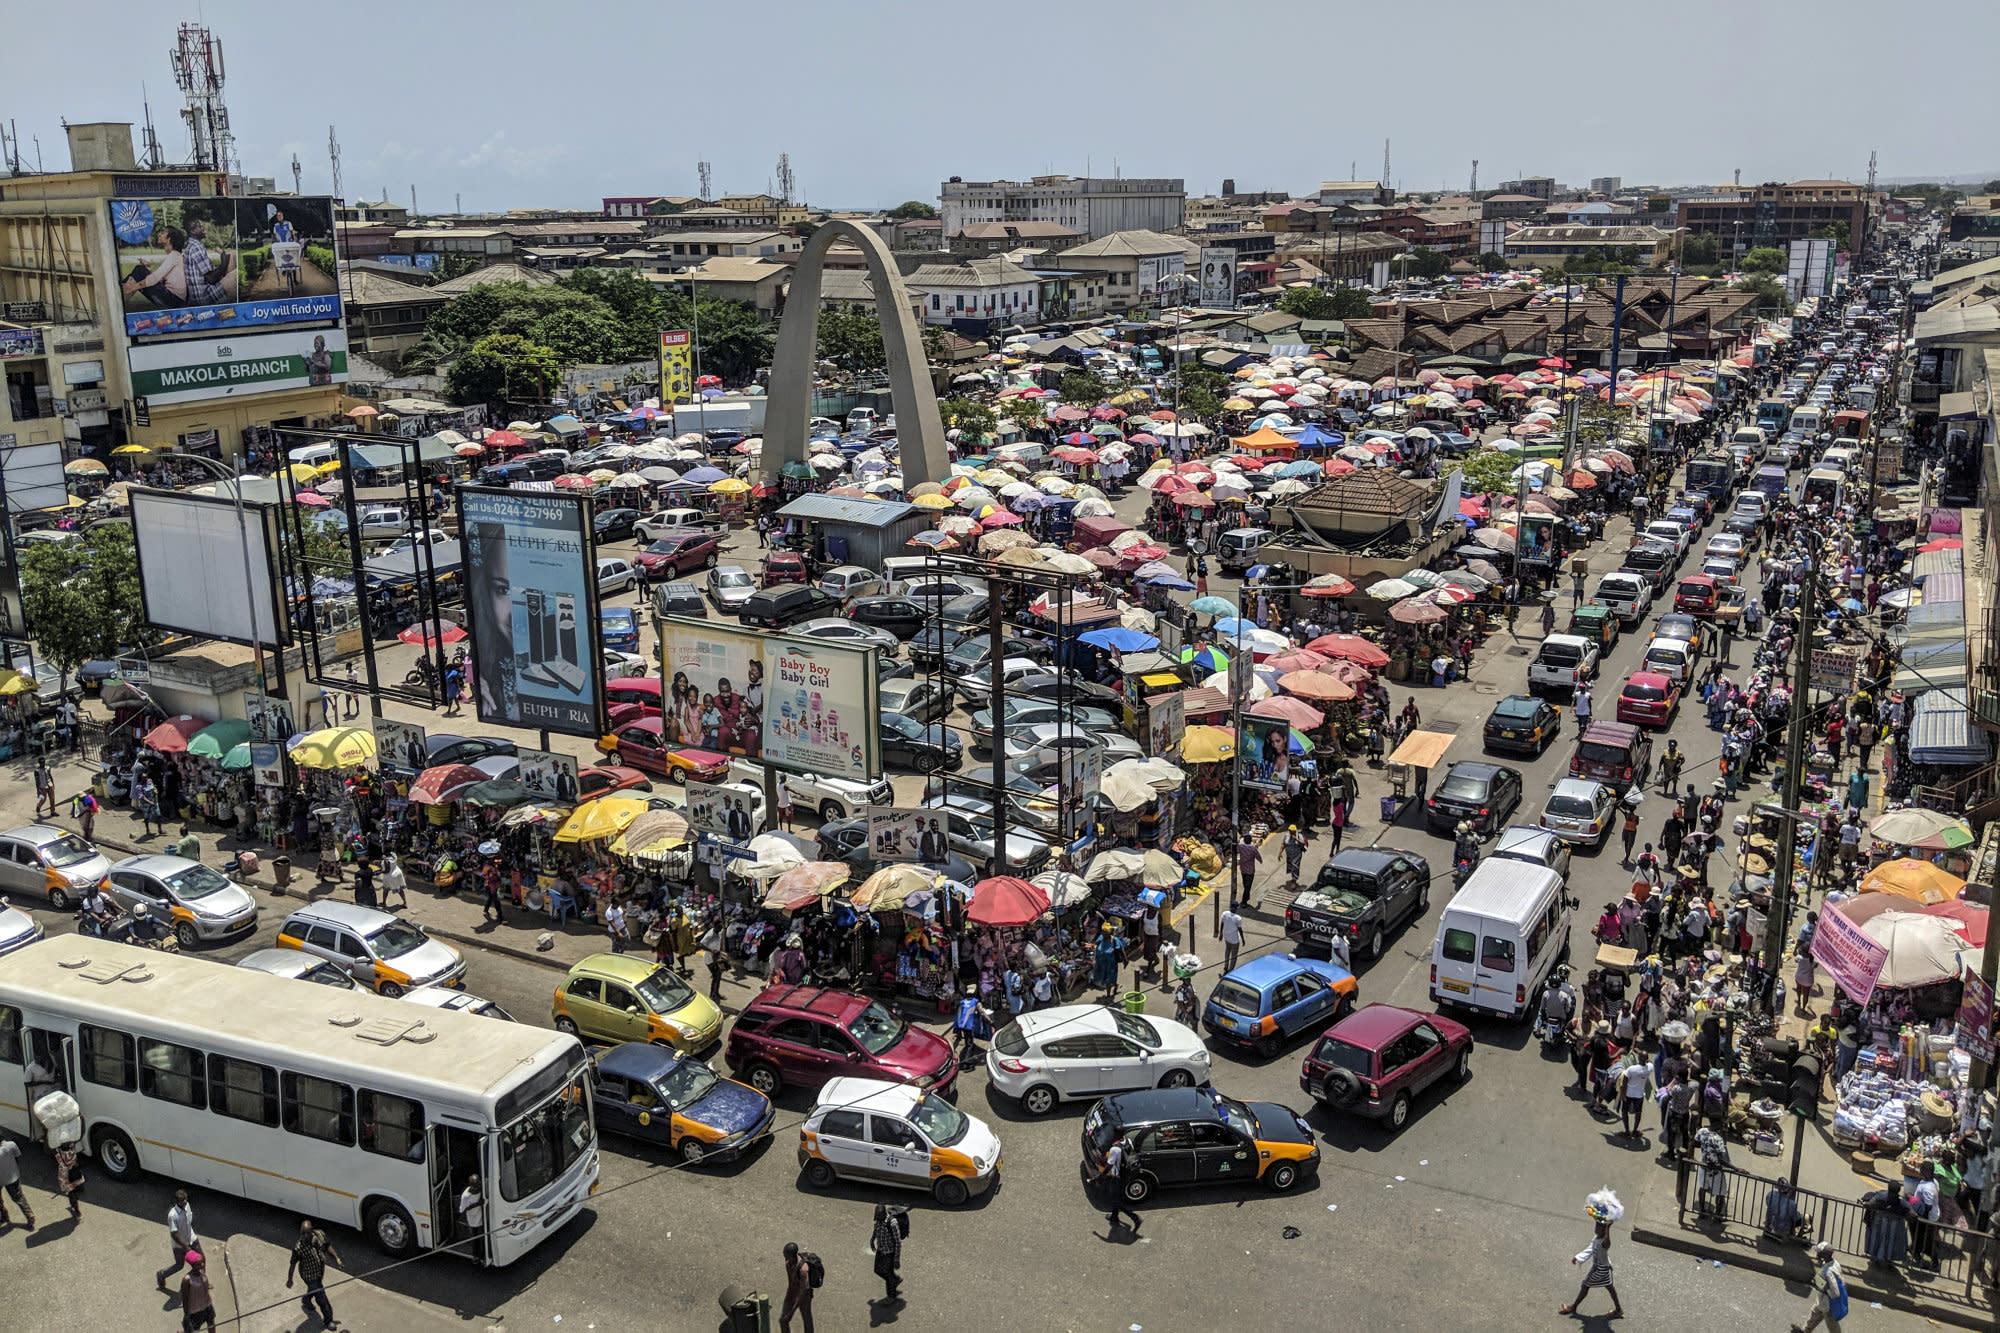 A $1.6 Billion Horror as Ghana Investors Can't Get Their Savings